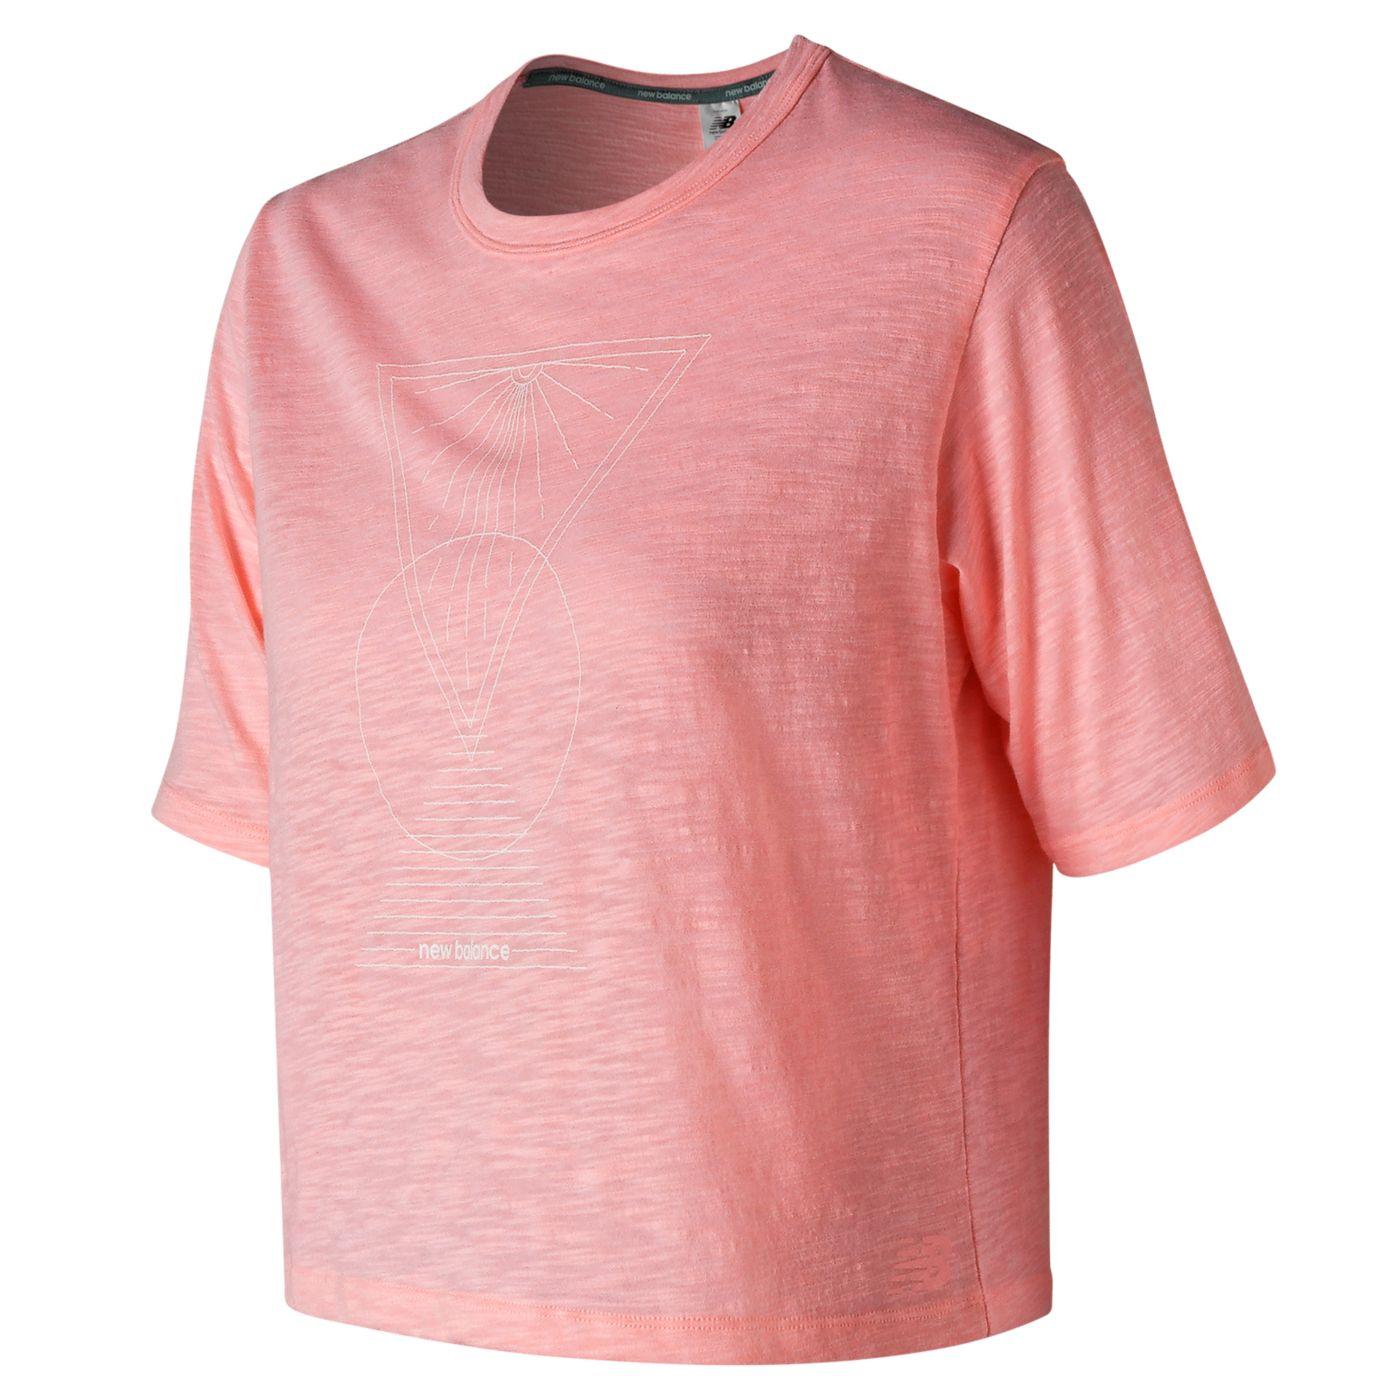 New Balance Women's Well Being Cropped T-Shirt